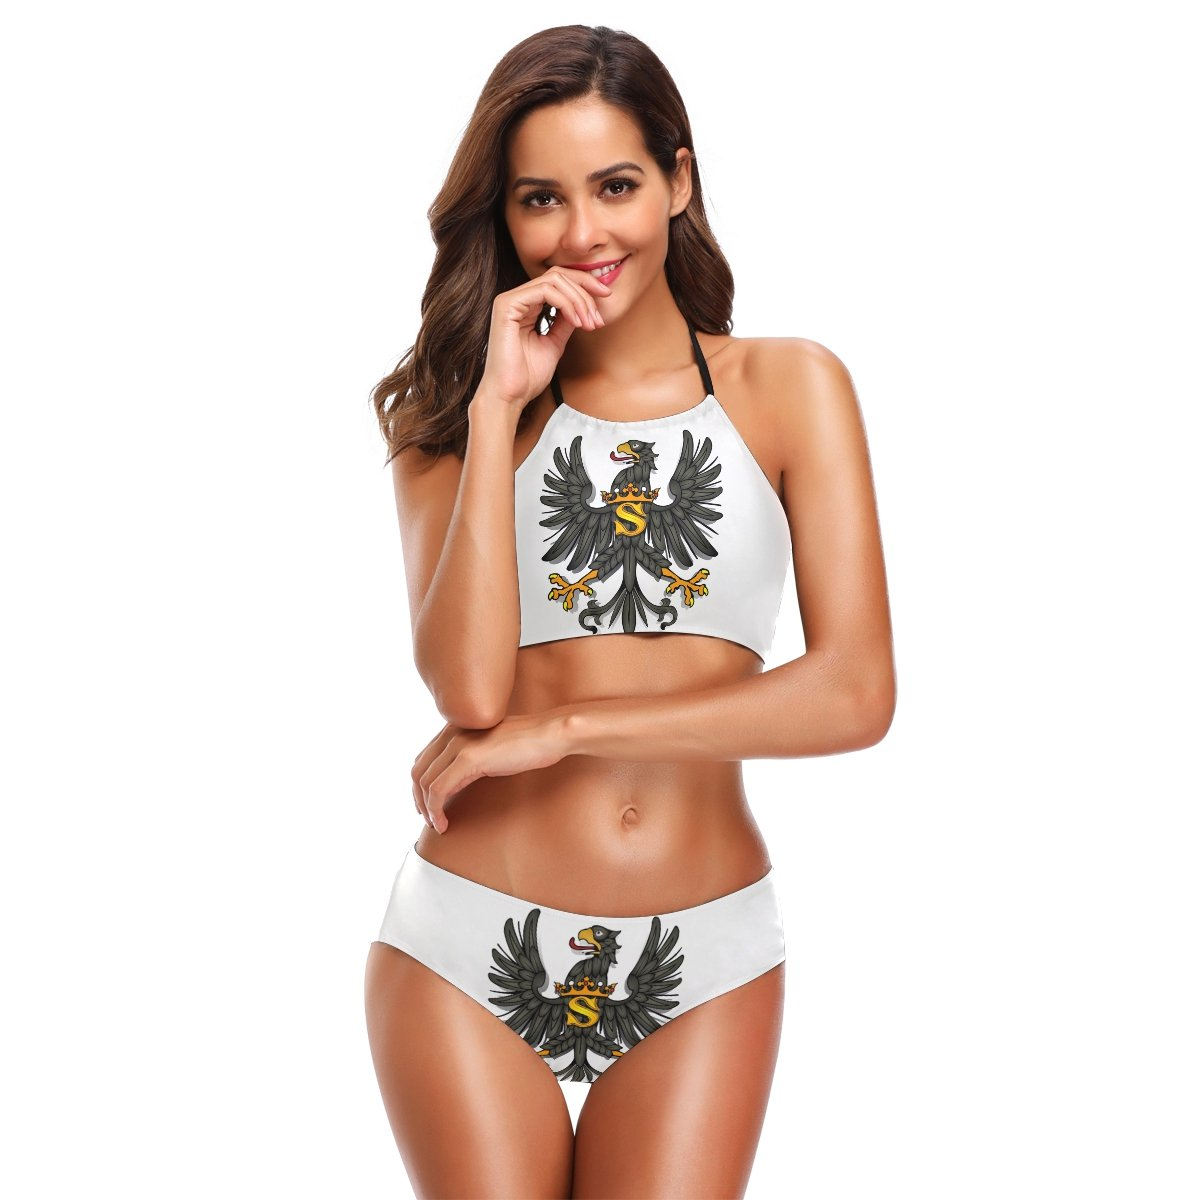 Beach bikini black girl gold woman consider, that